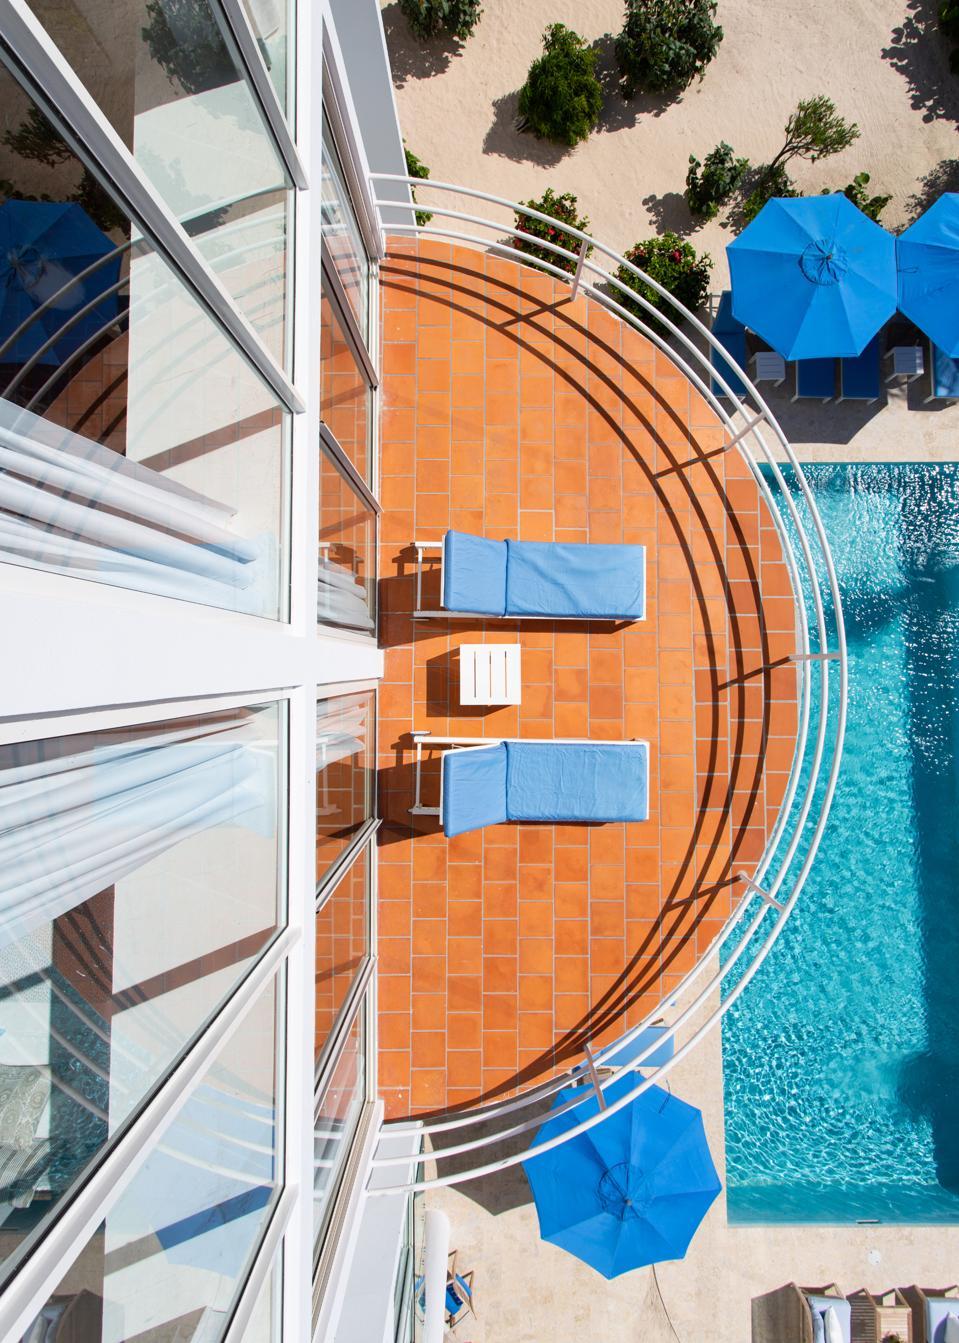 Balcony overlooking pool at Anguilla villa